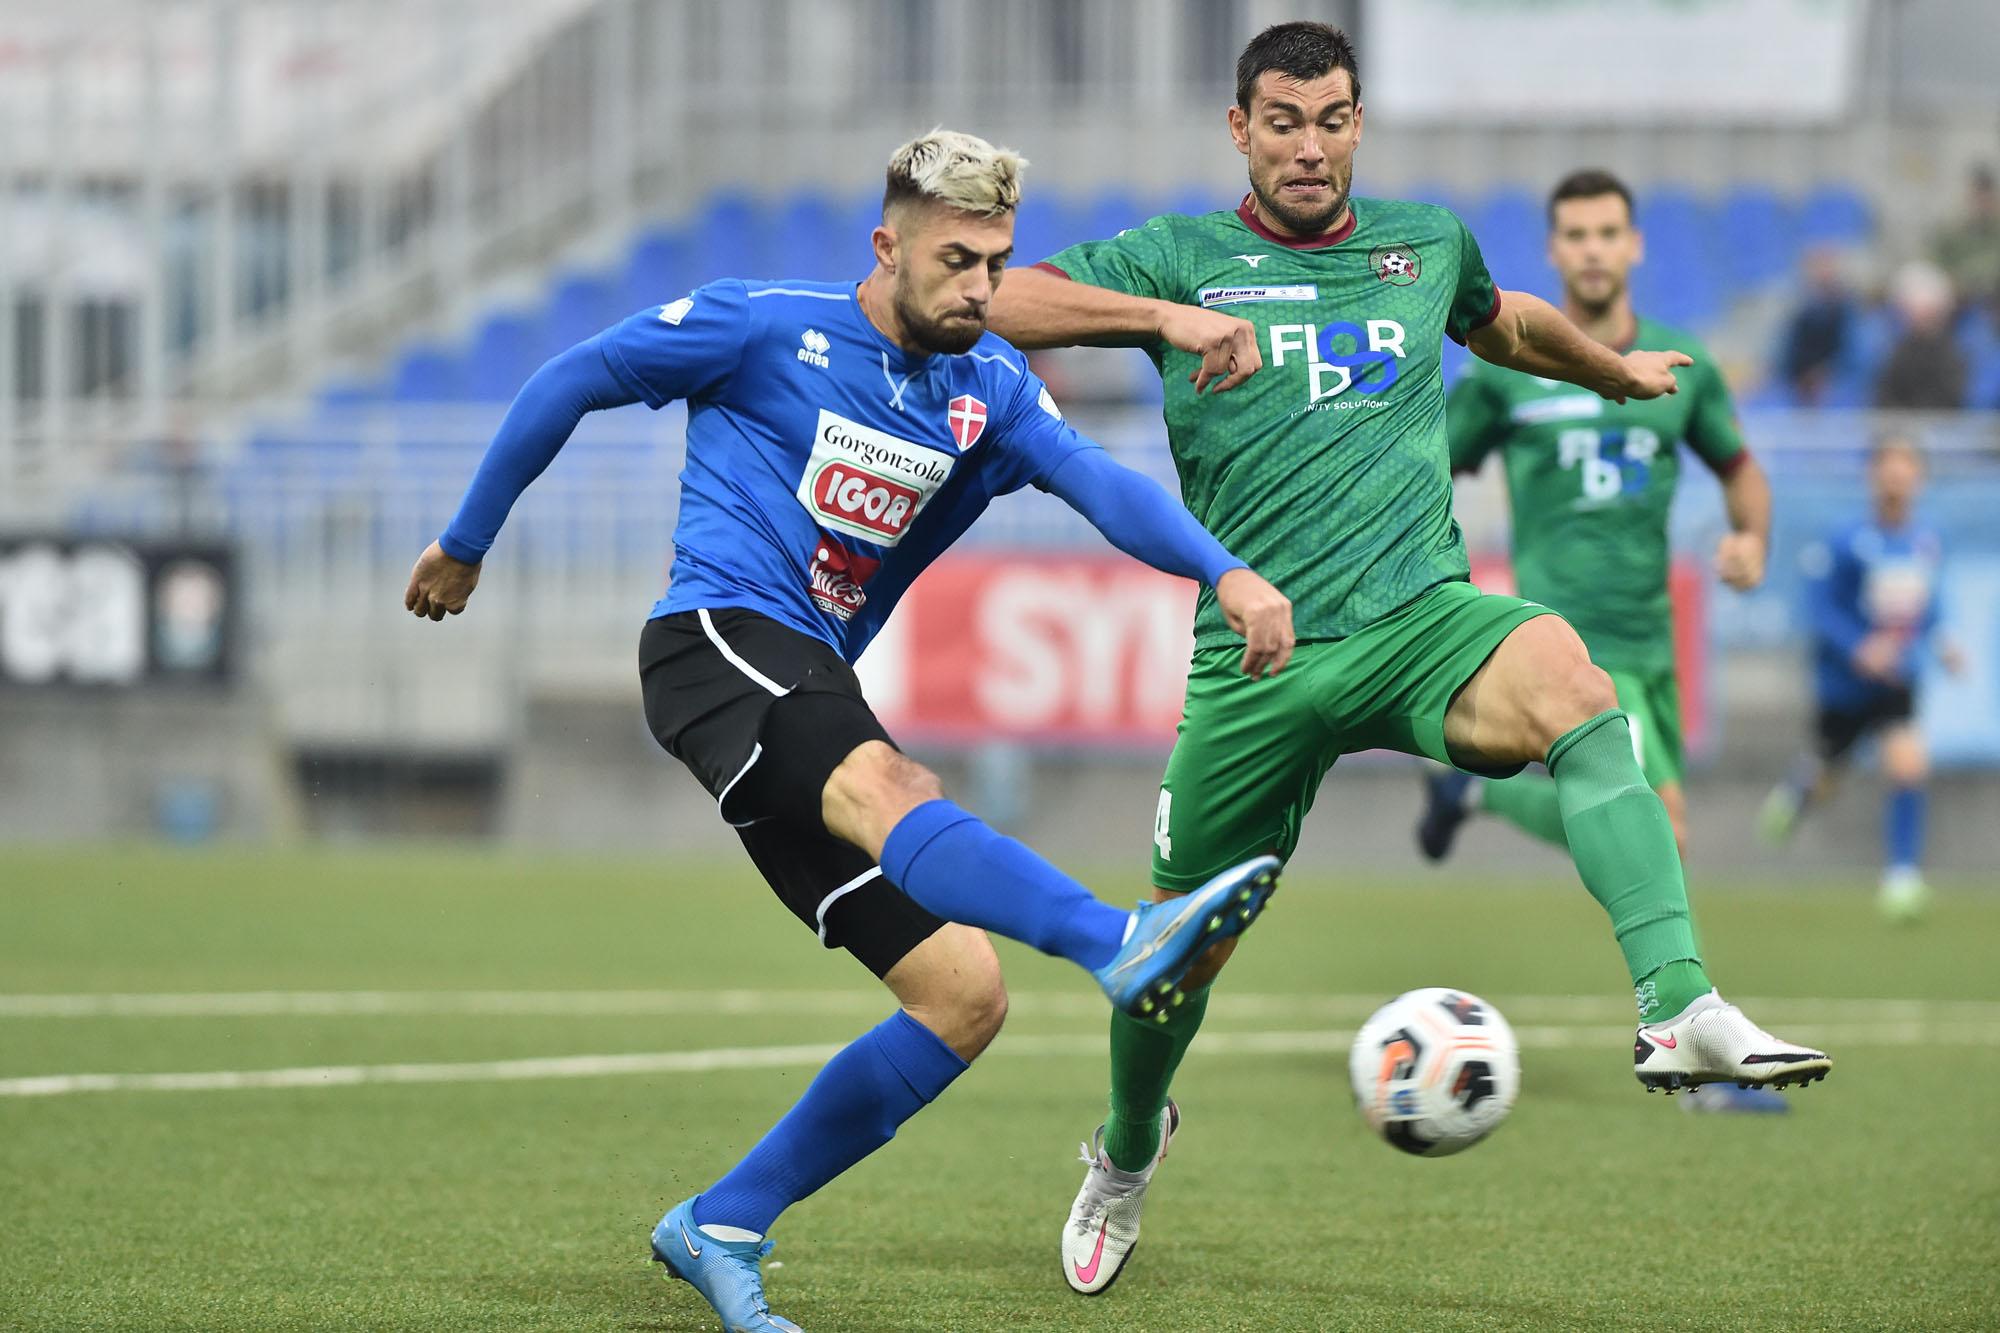 Read more about the article Novara-RG Ticino 3-1 | Tabellino del match